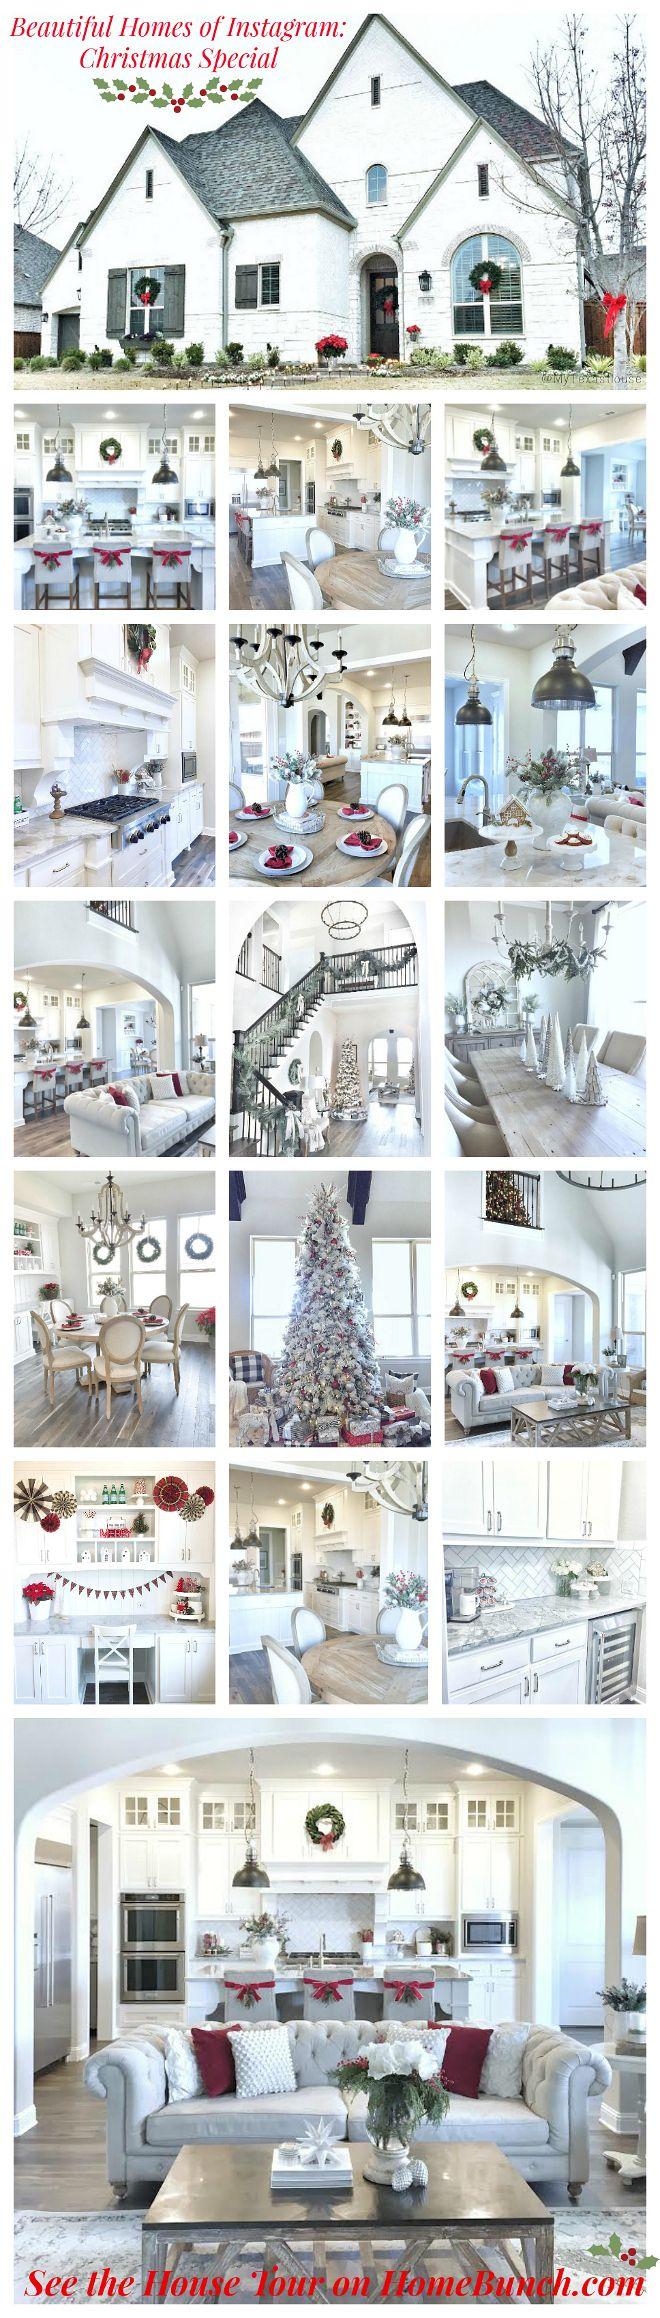 1033 best Christmas Decor images on Pinterest | Christmas decor ...